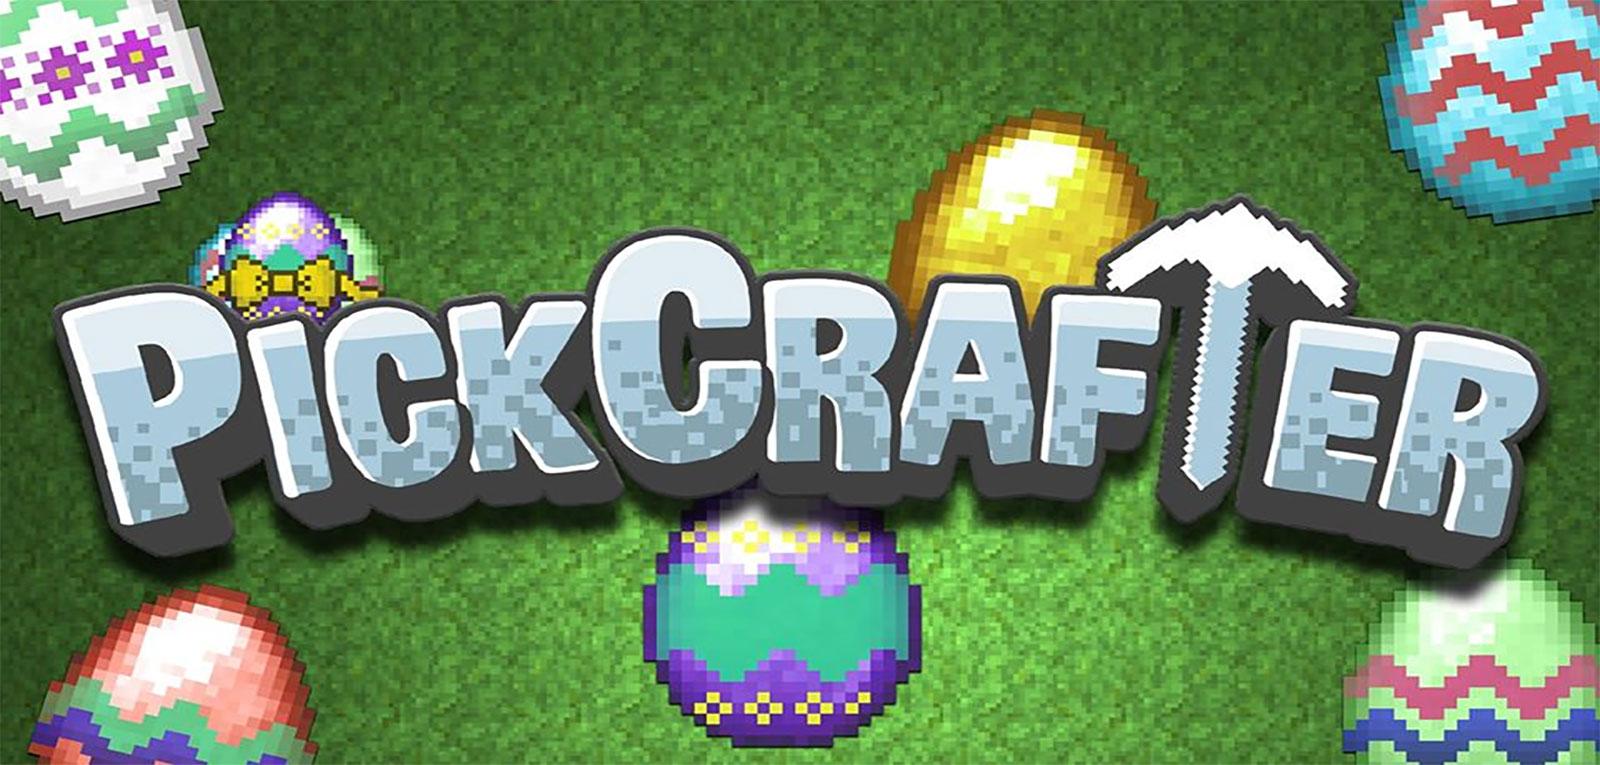 PickCrafter - Idle Craft Game Mod Apk